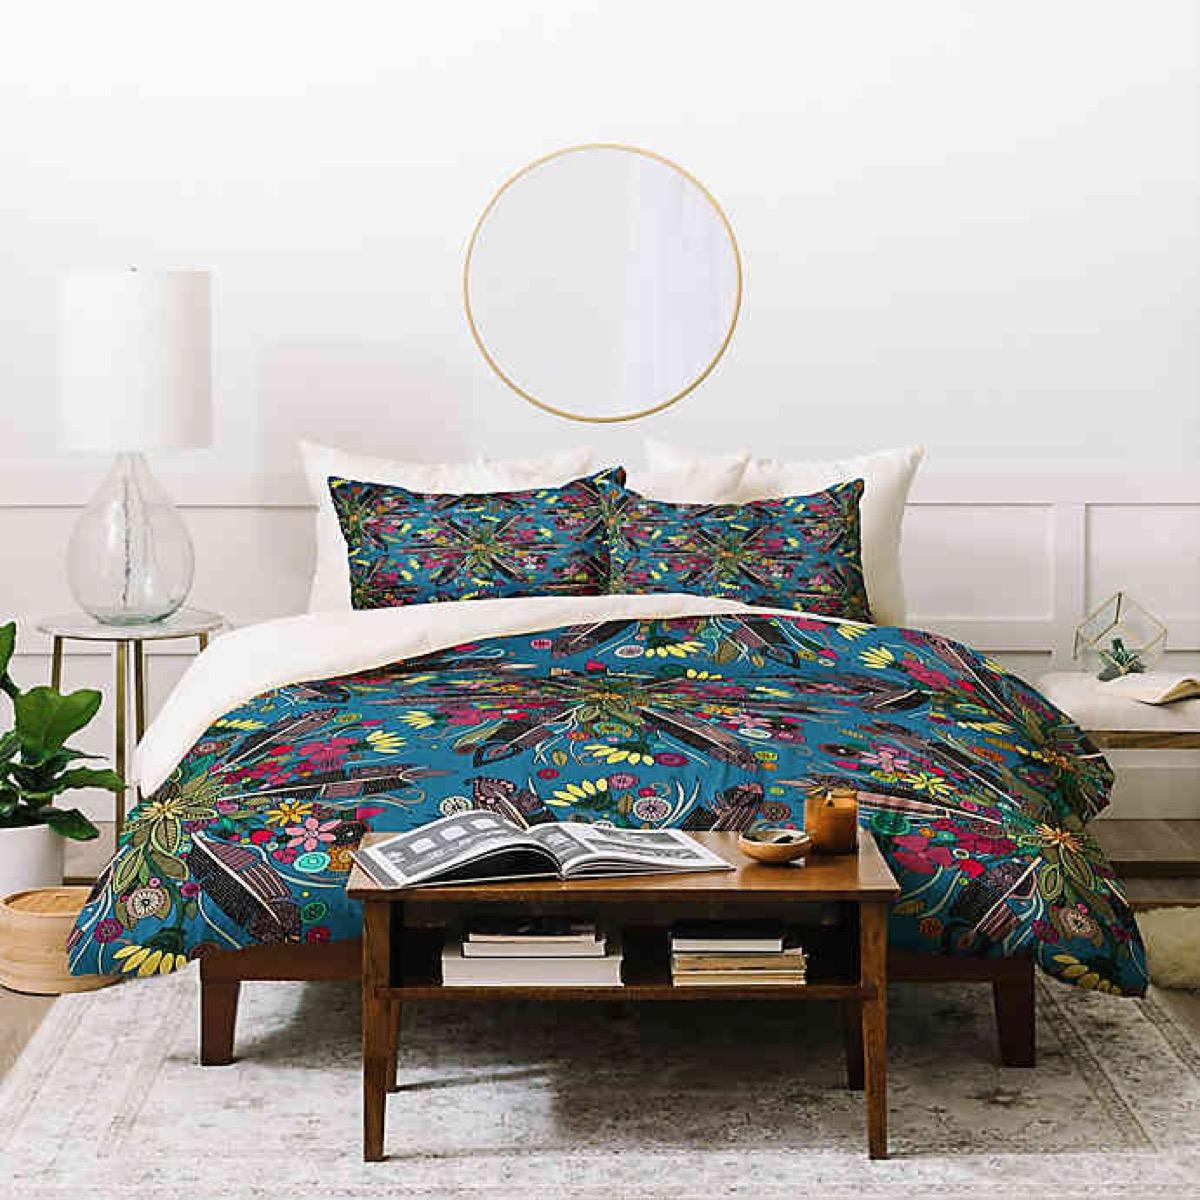 Geometric bedding